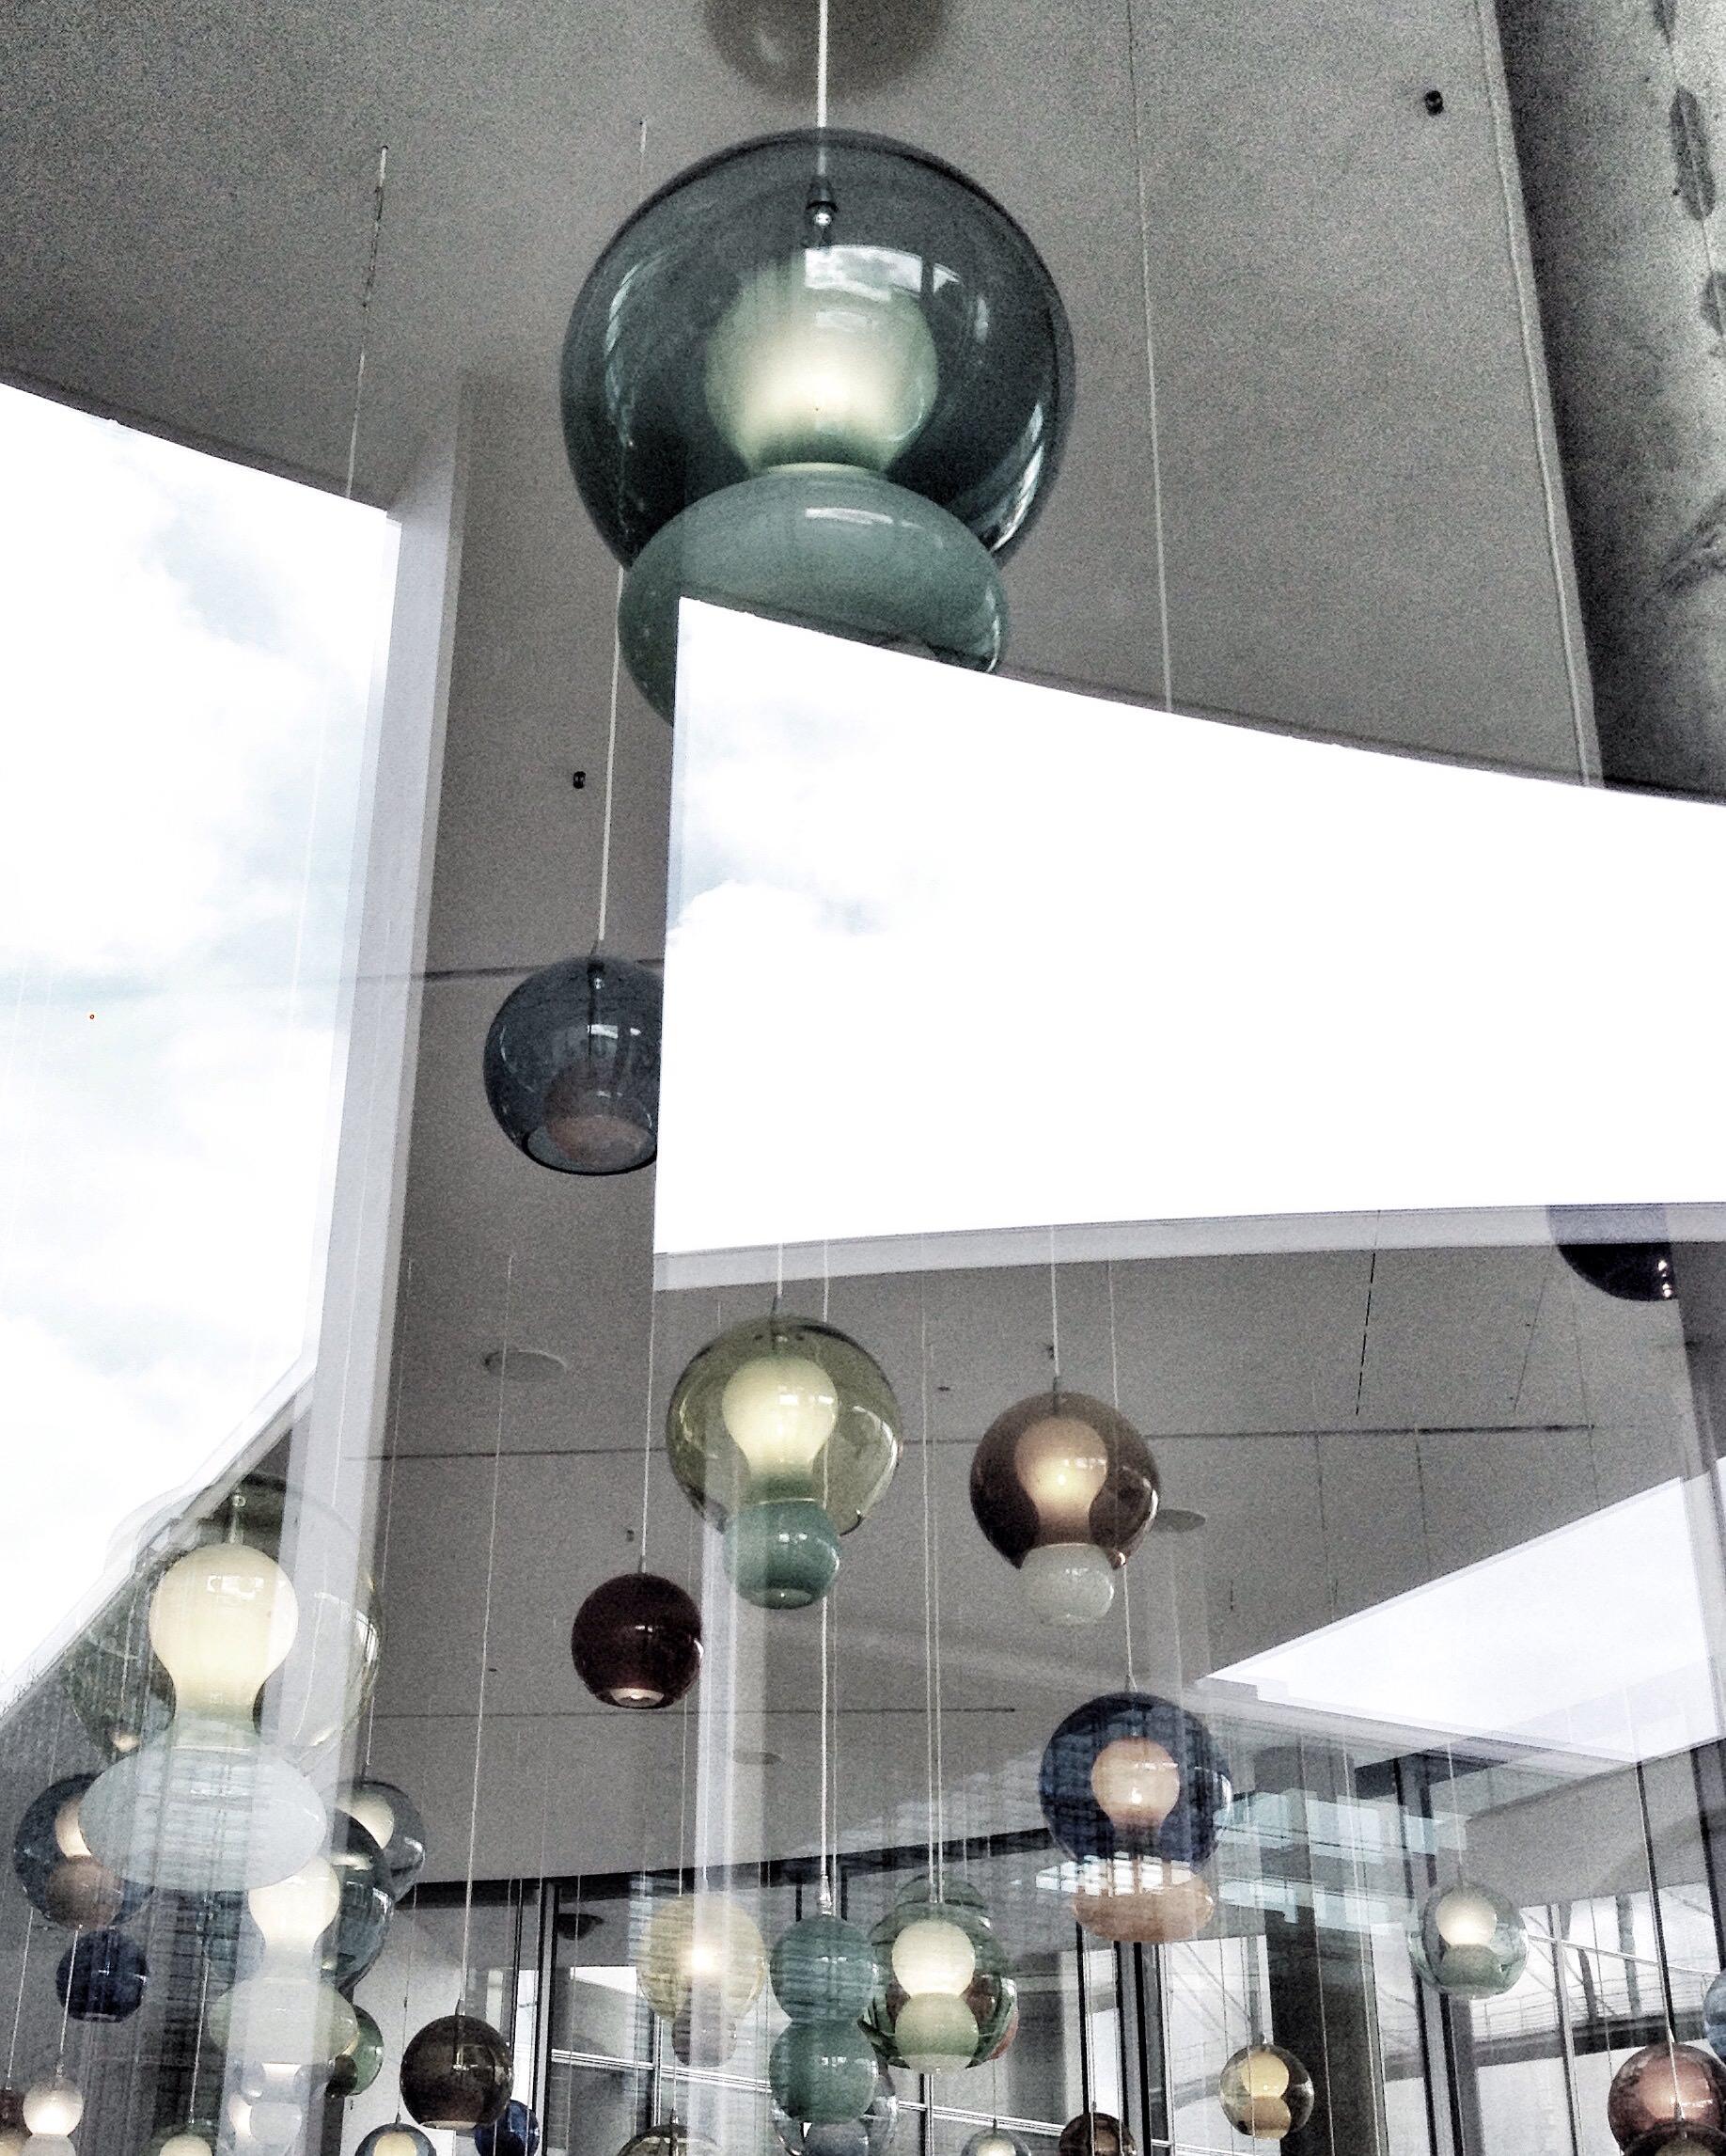 Lampen, Restaurant Paul-Löbe-Haus, Platz der Republik 1, Berlin, May 2016